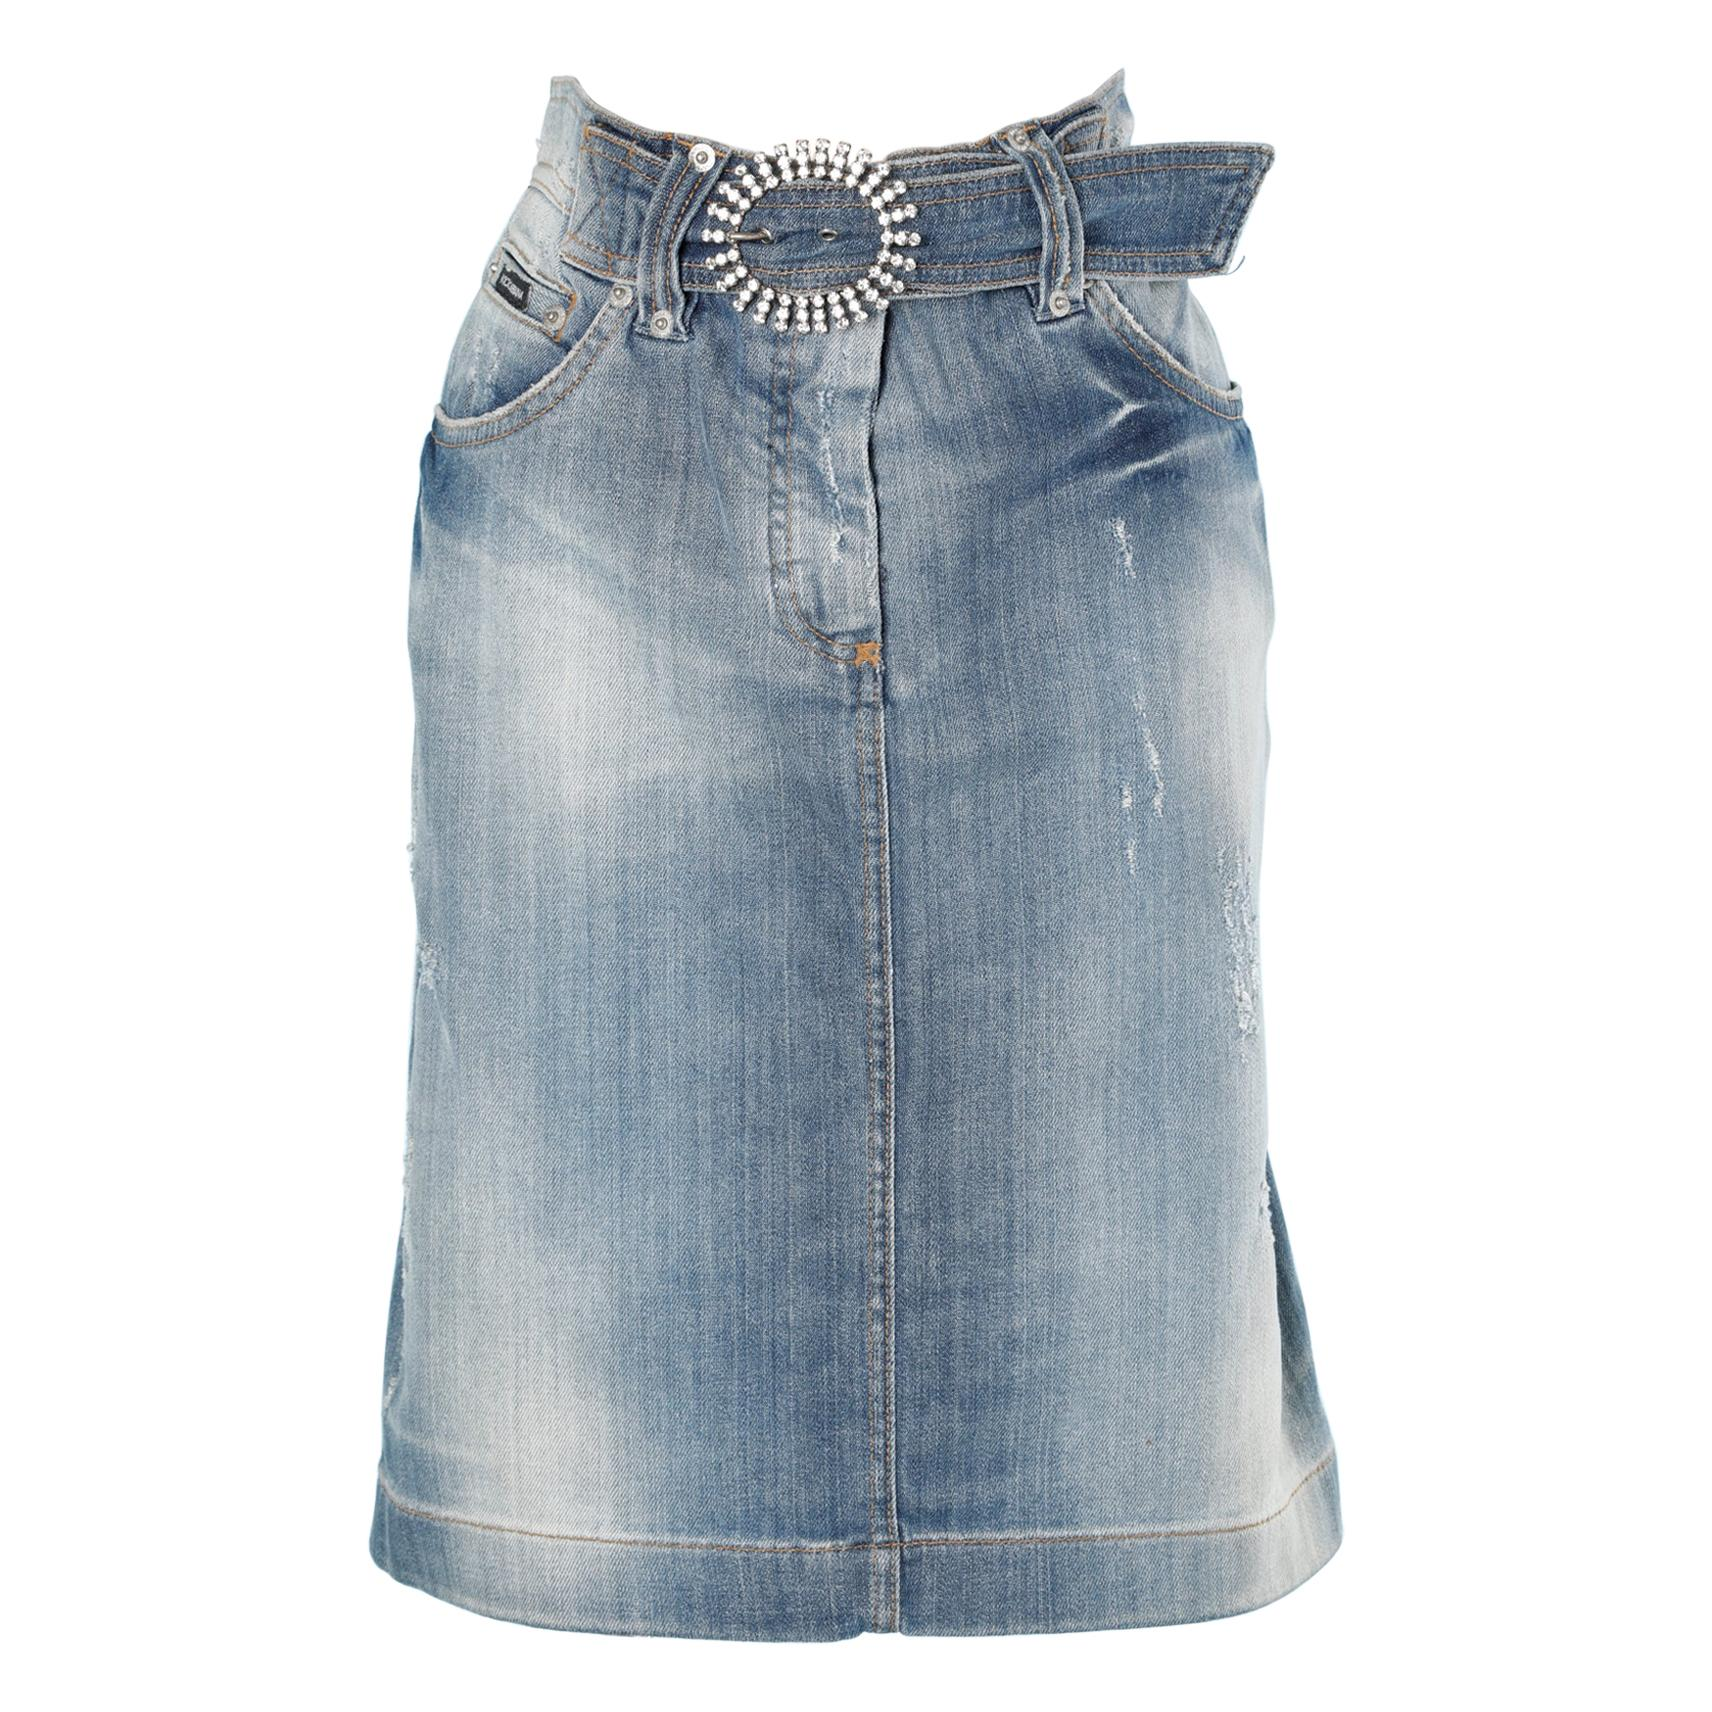 Denim skirt with rhinestone belt buckle Dolce & Gabbana